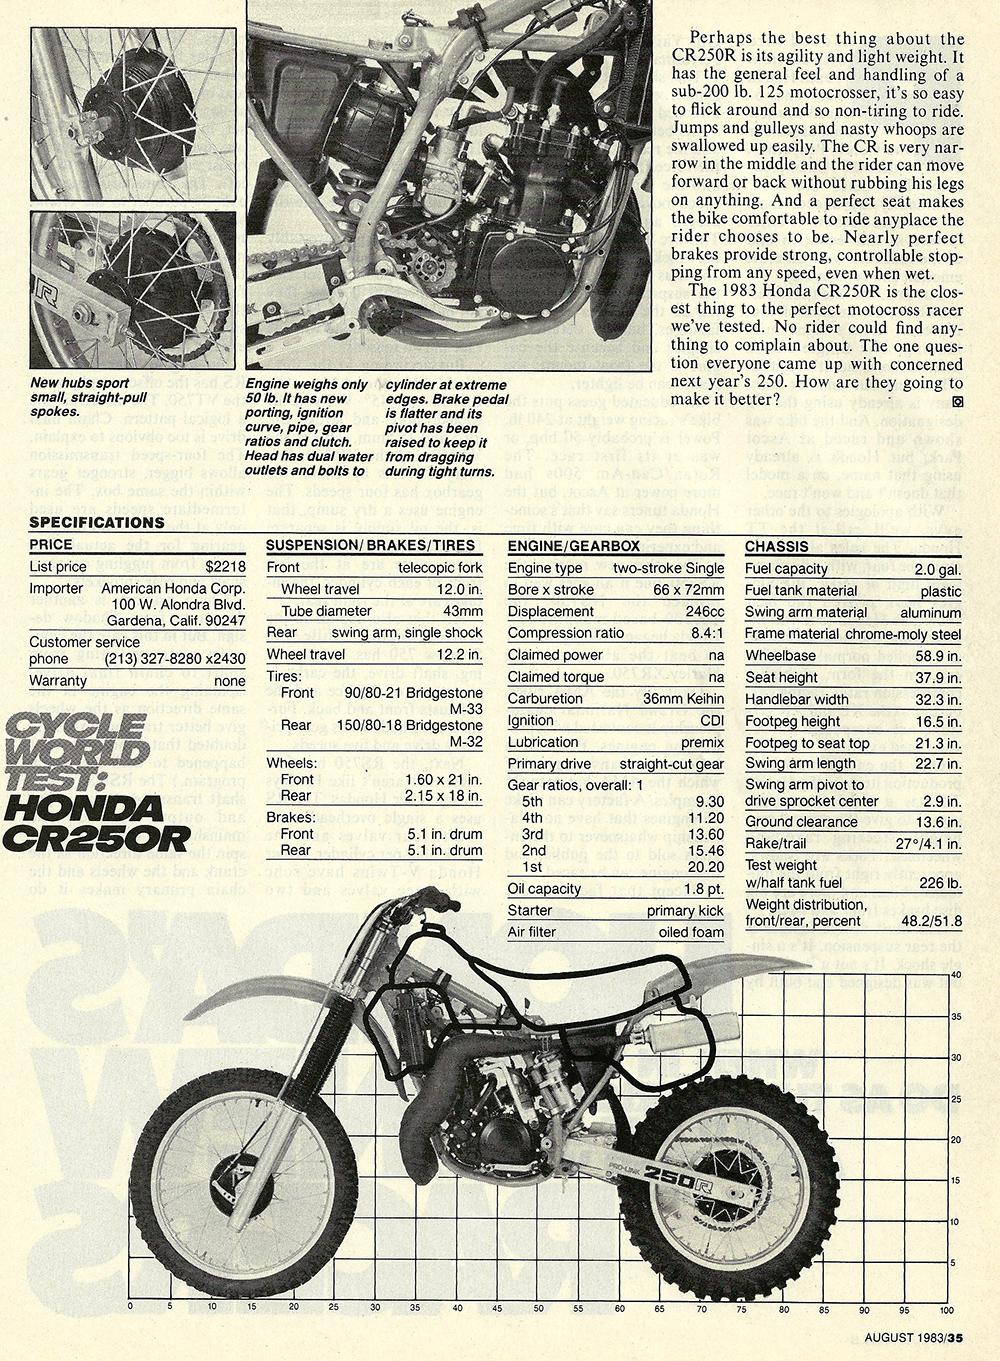 1983 Honda CR250R road test 04.jpg